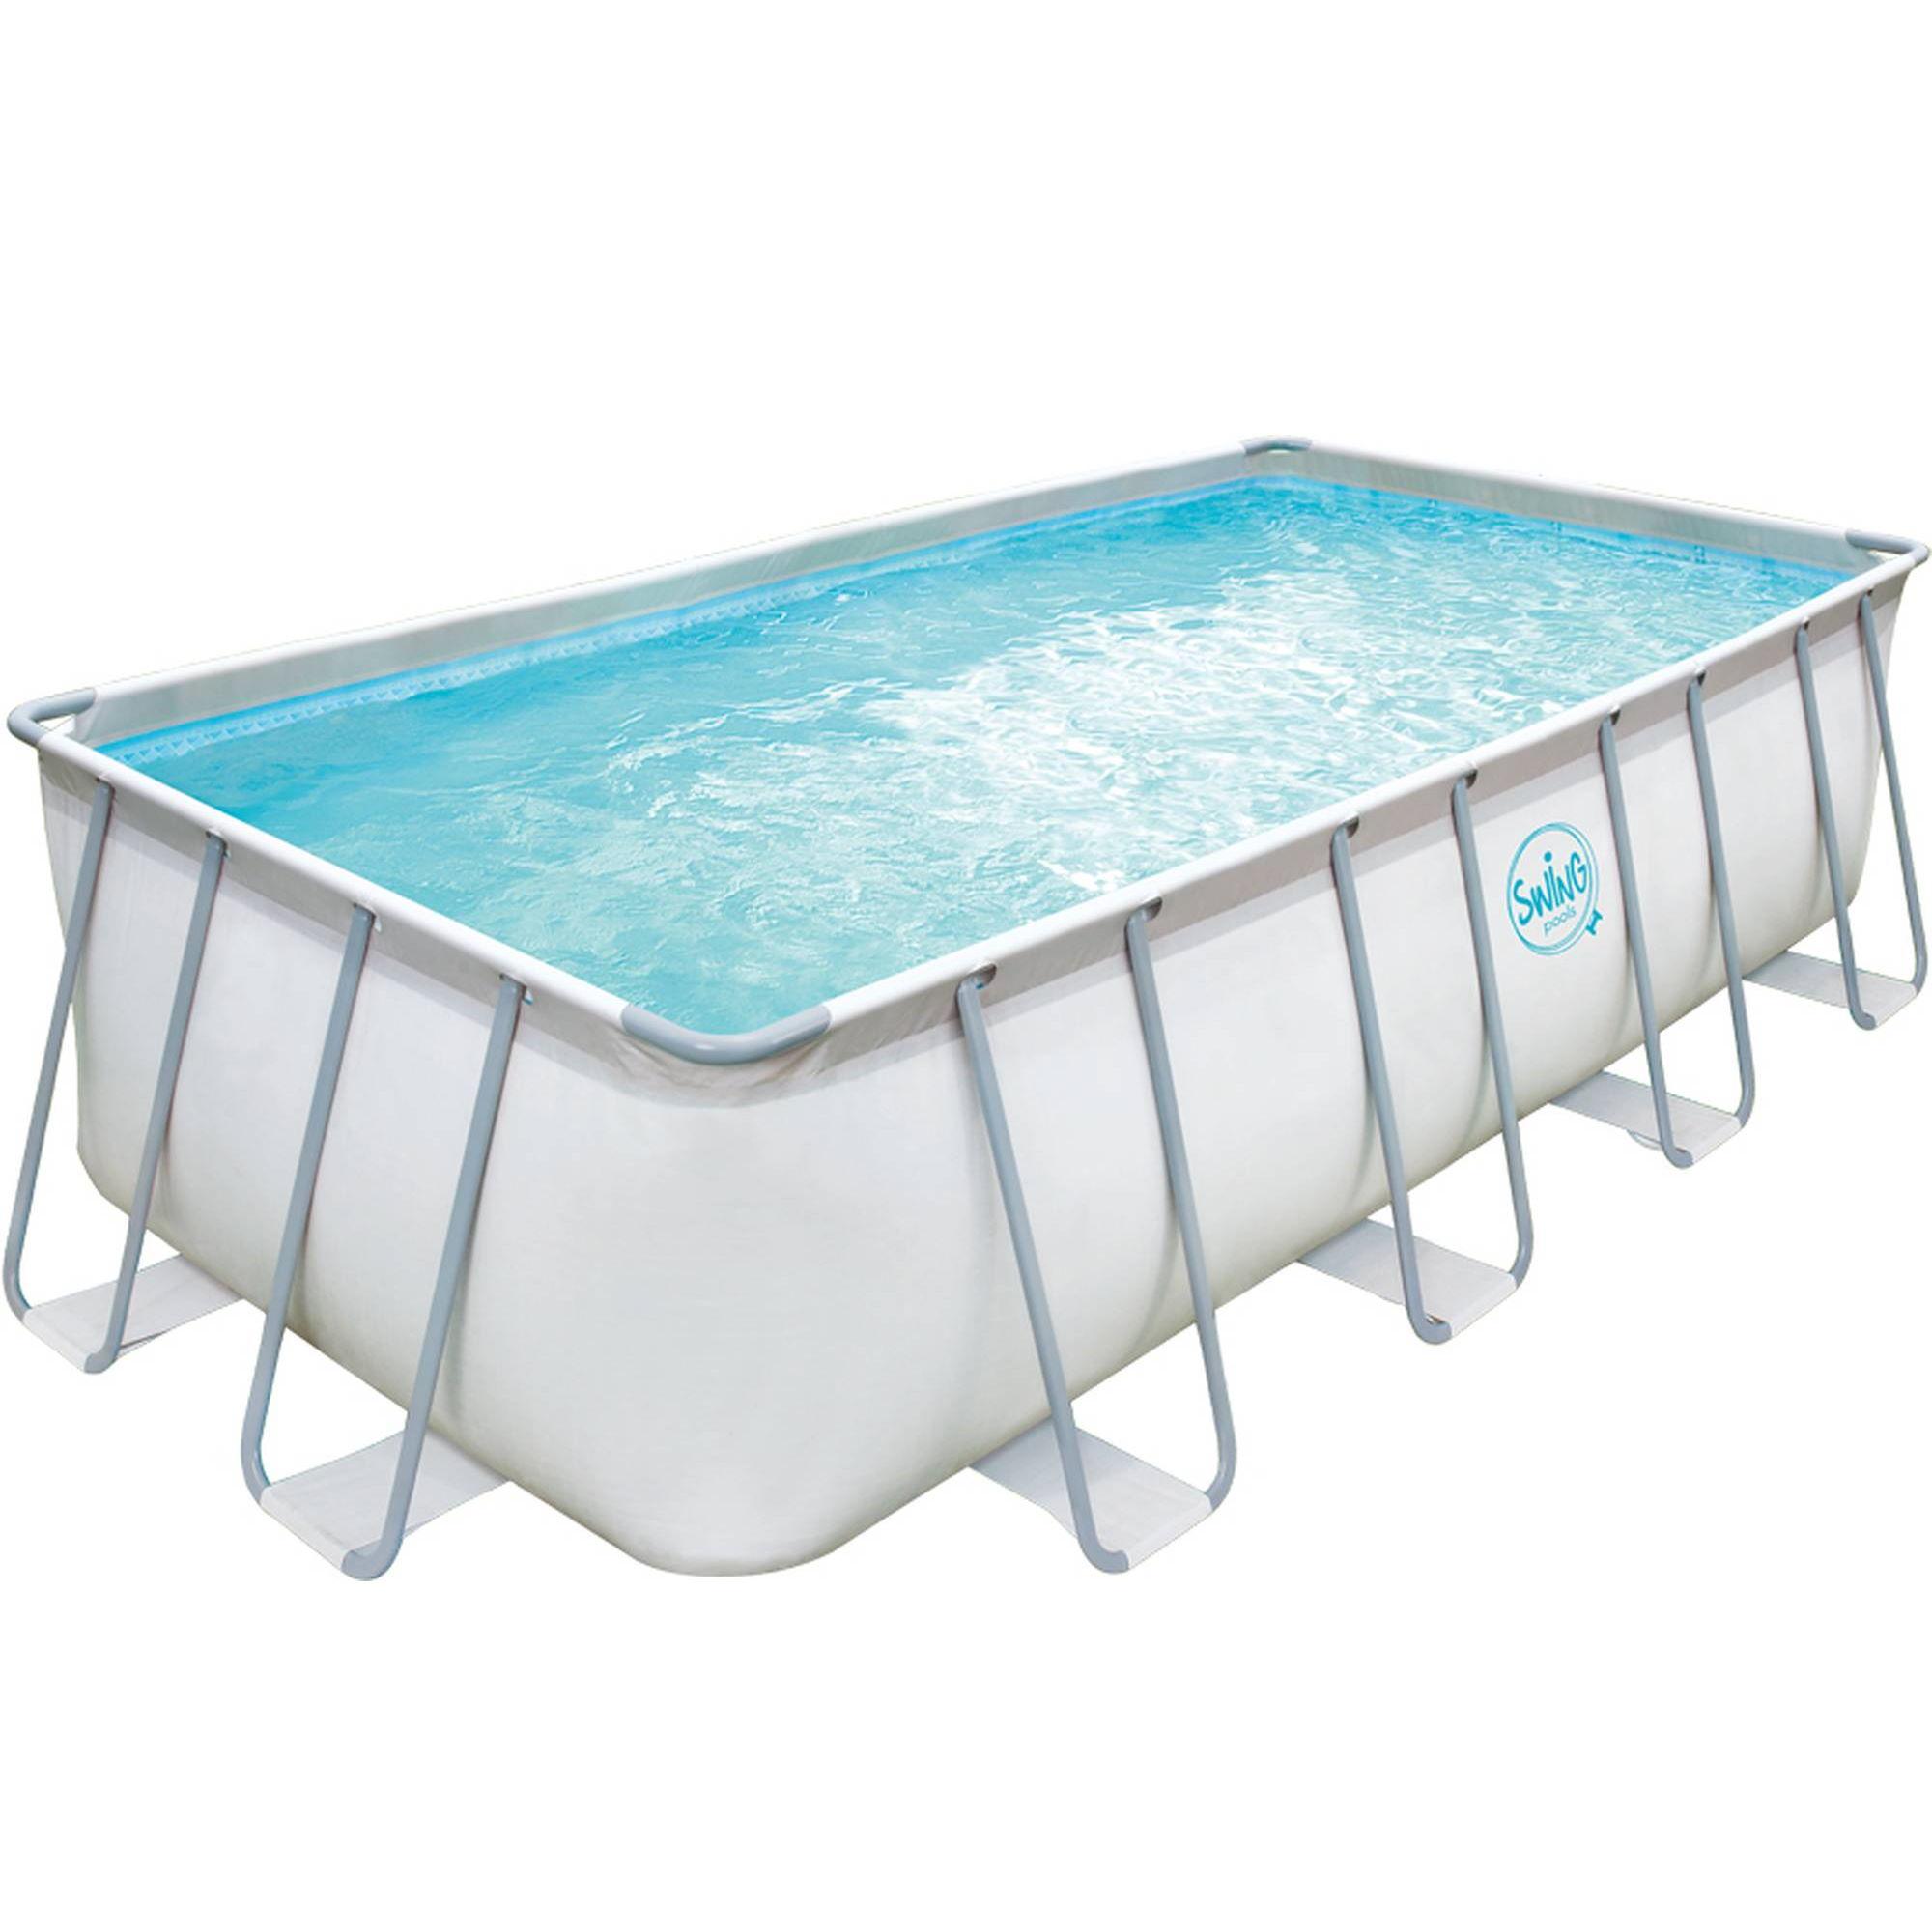 Elite Frame Pool hellgrau rechteckig 549x274x132cm solo